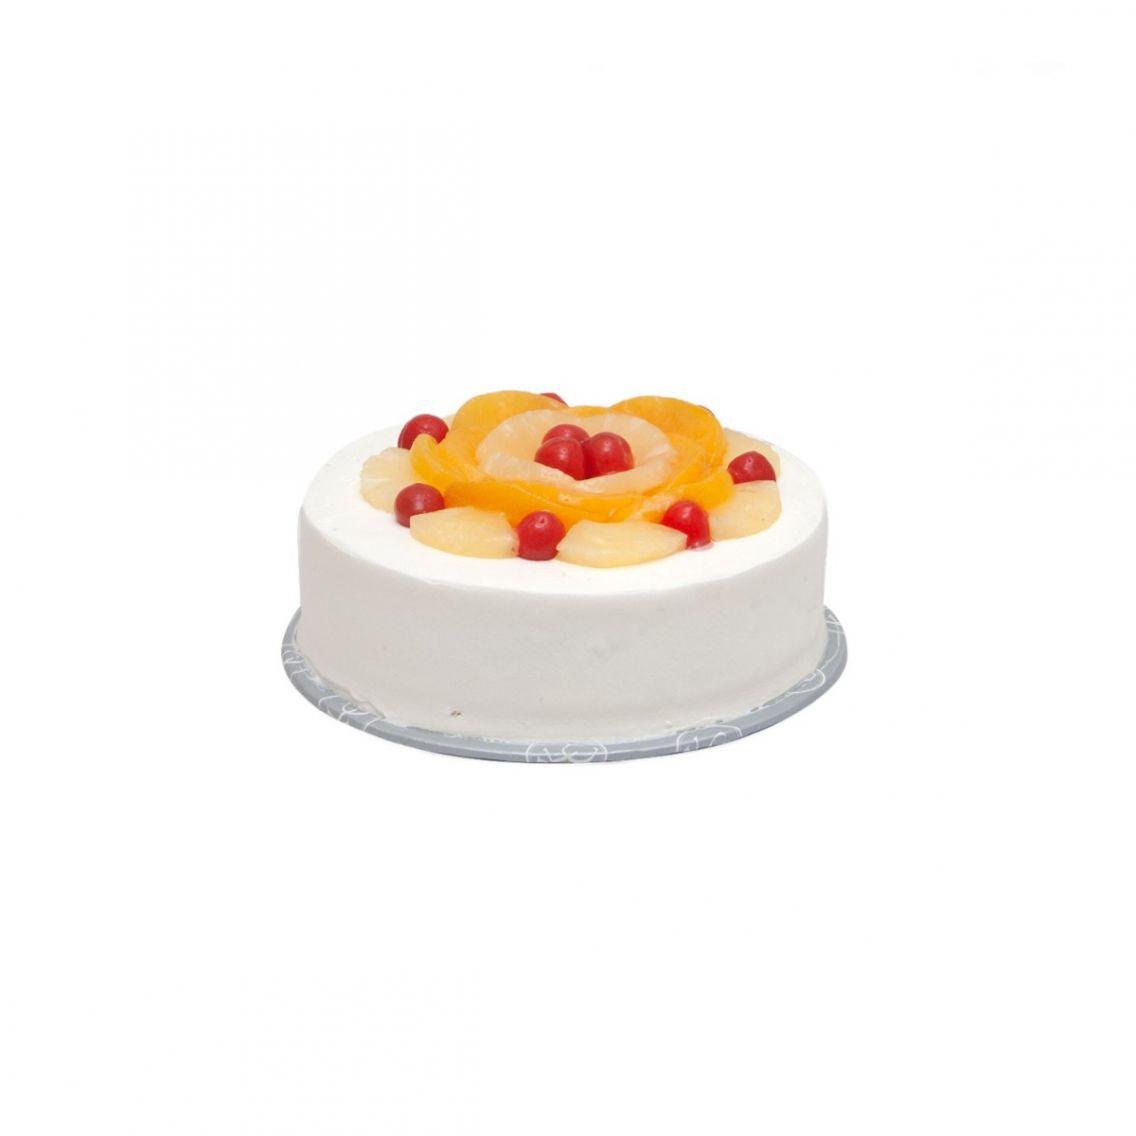 Kitchen Cuisine Default Category Mixed Fruit Cake